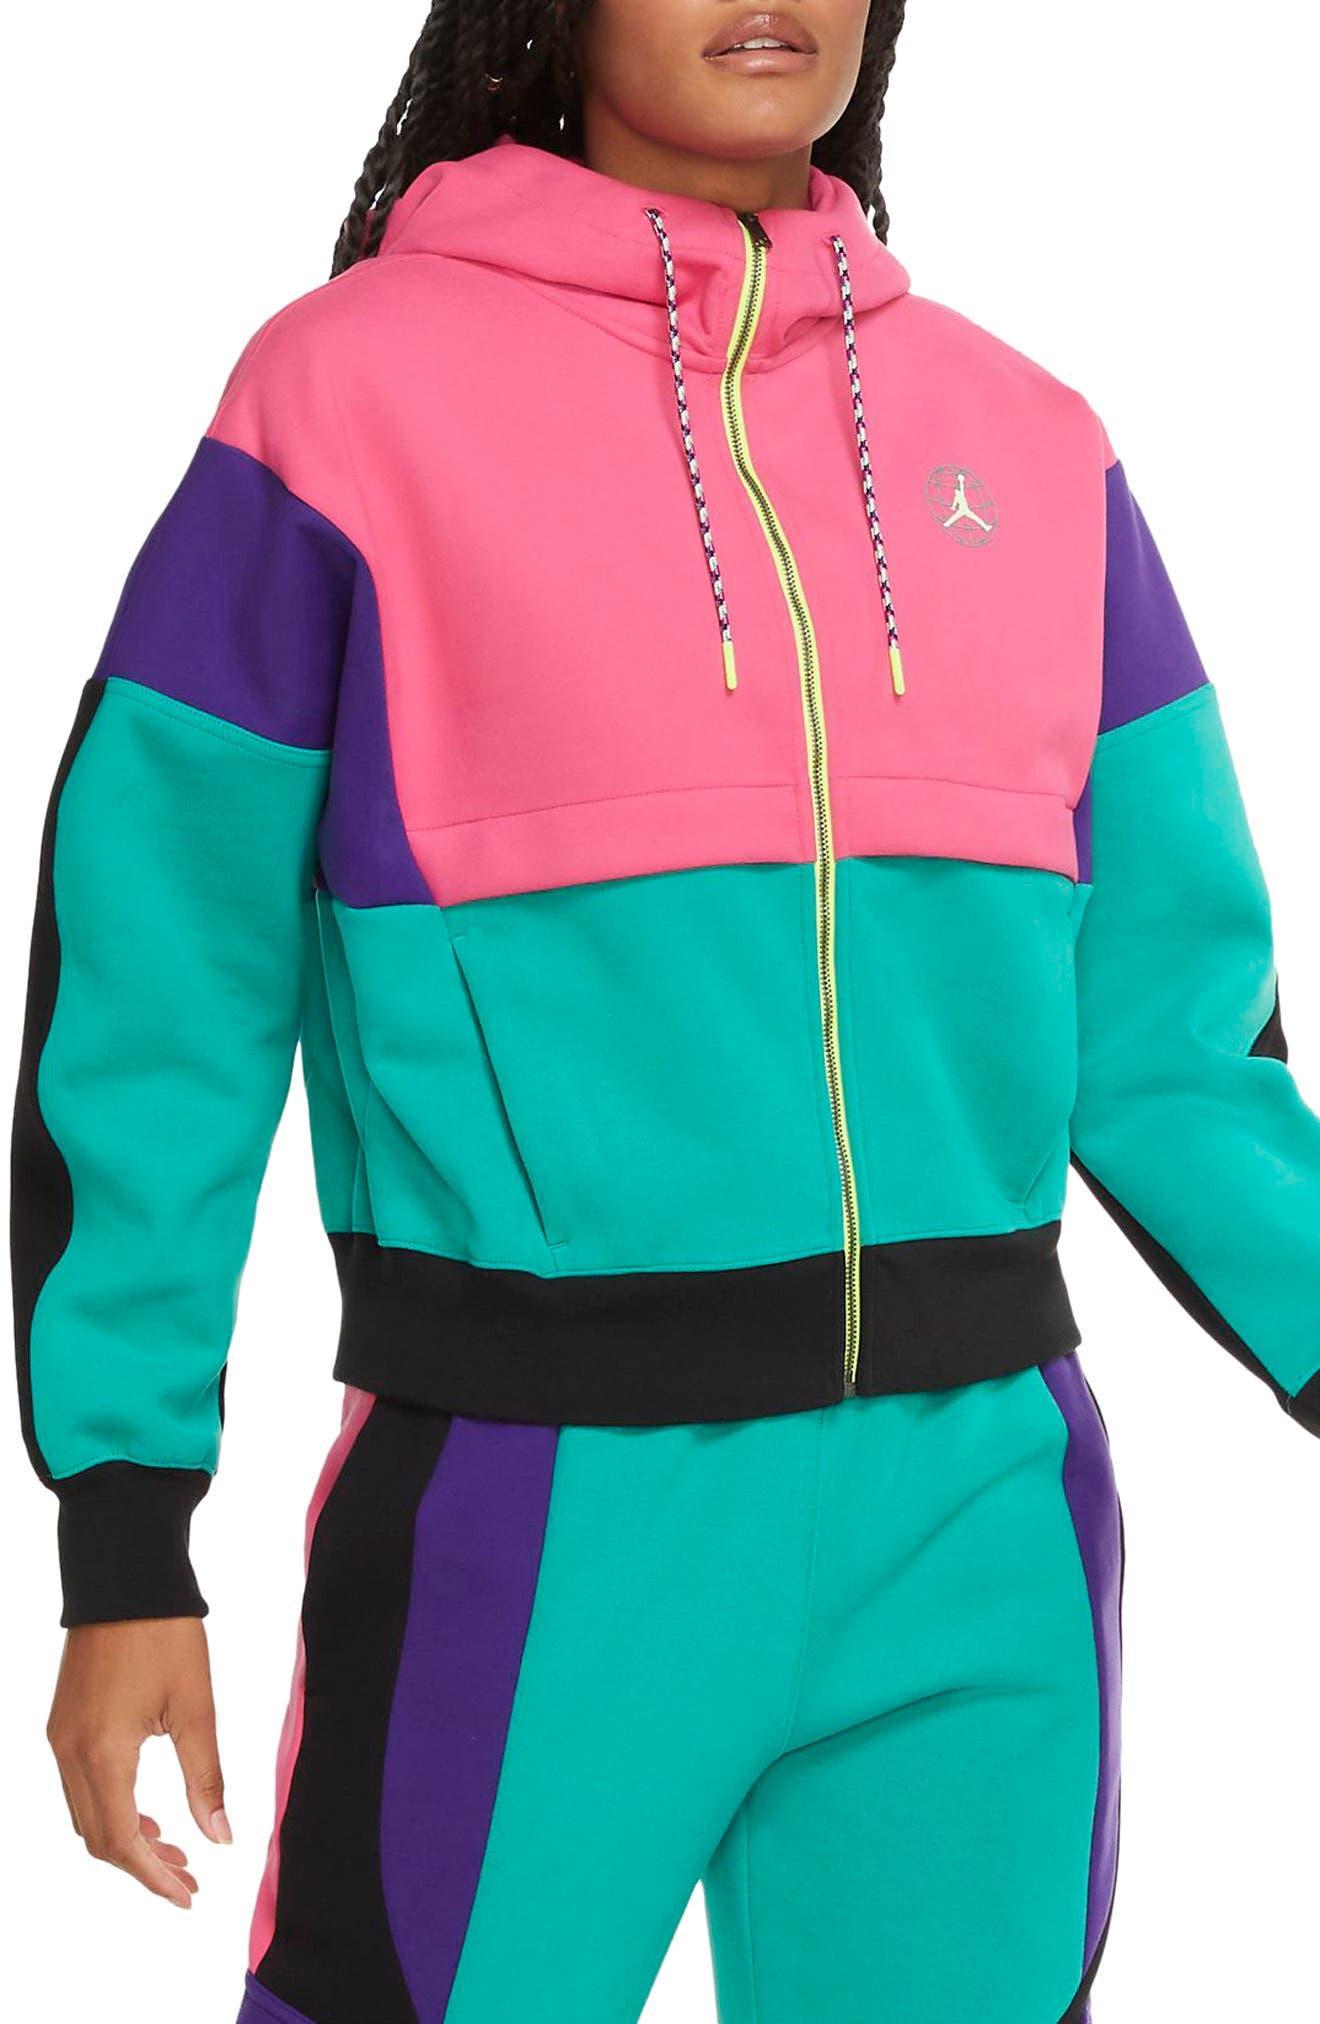 Women's Jordan Sweatshirts \u0026 Hoodies